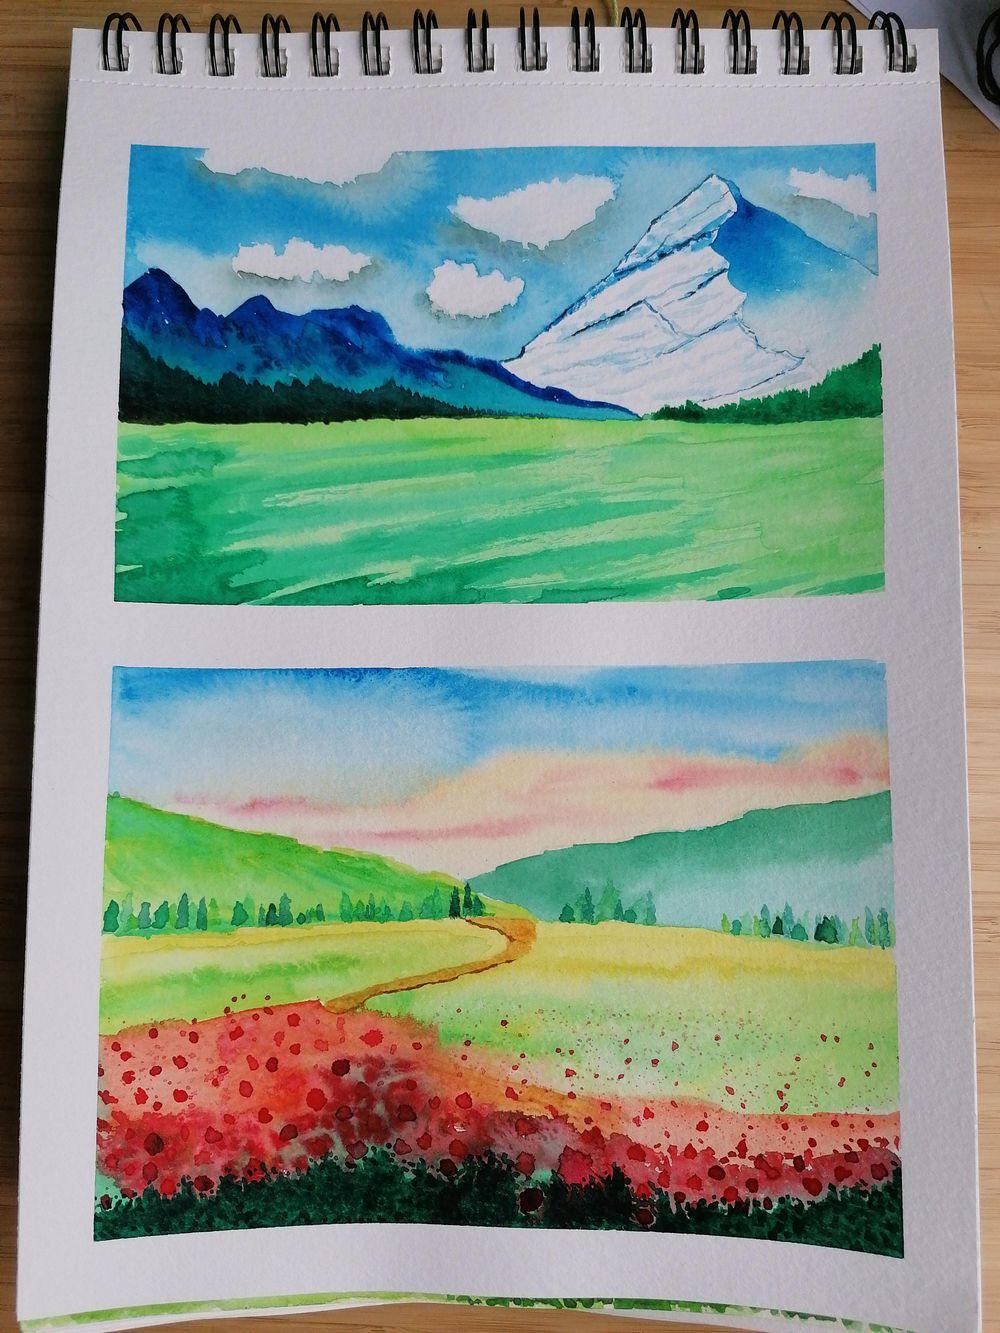 Watercolor landscape - image 5 - student project